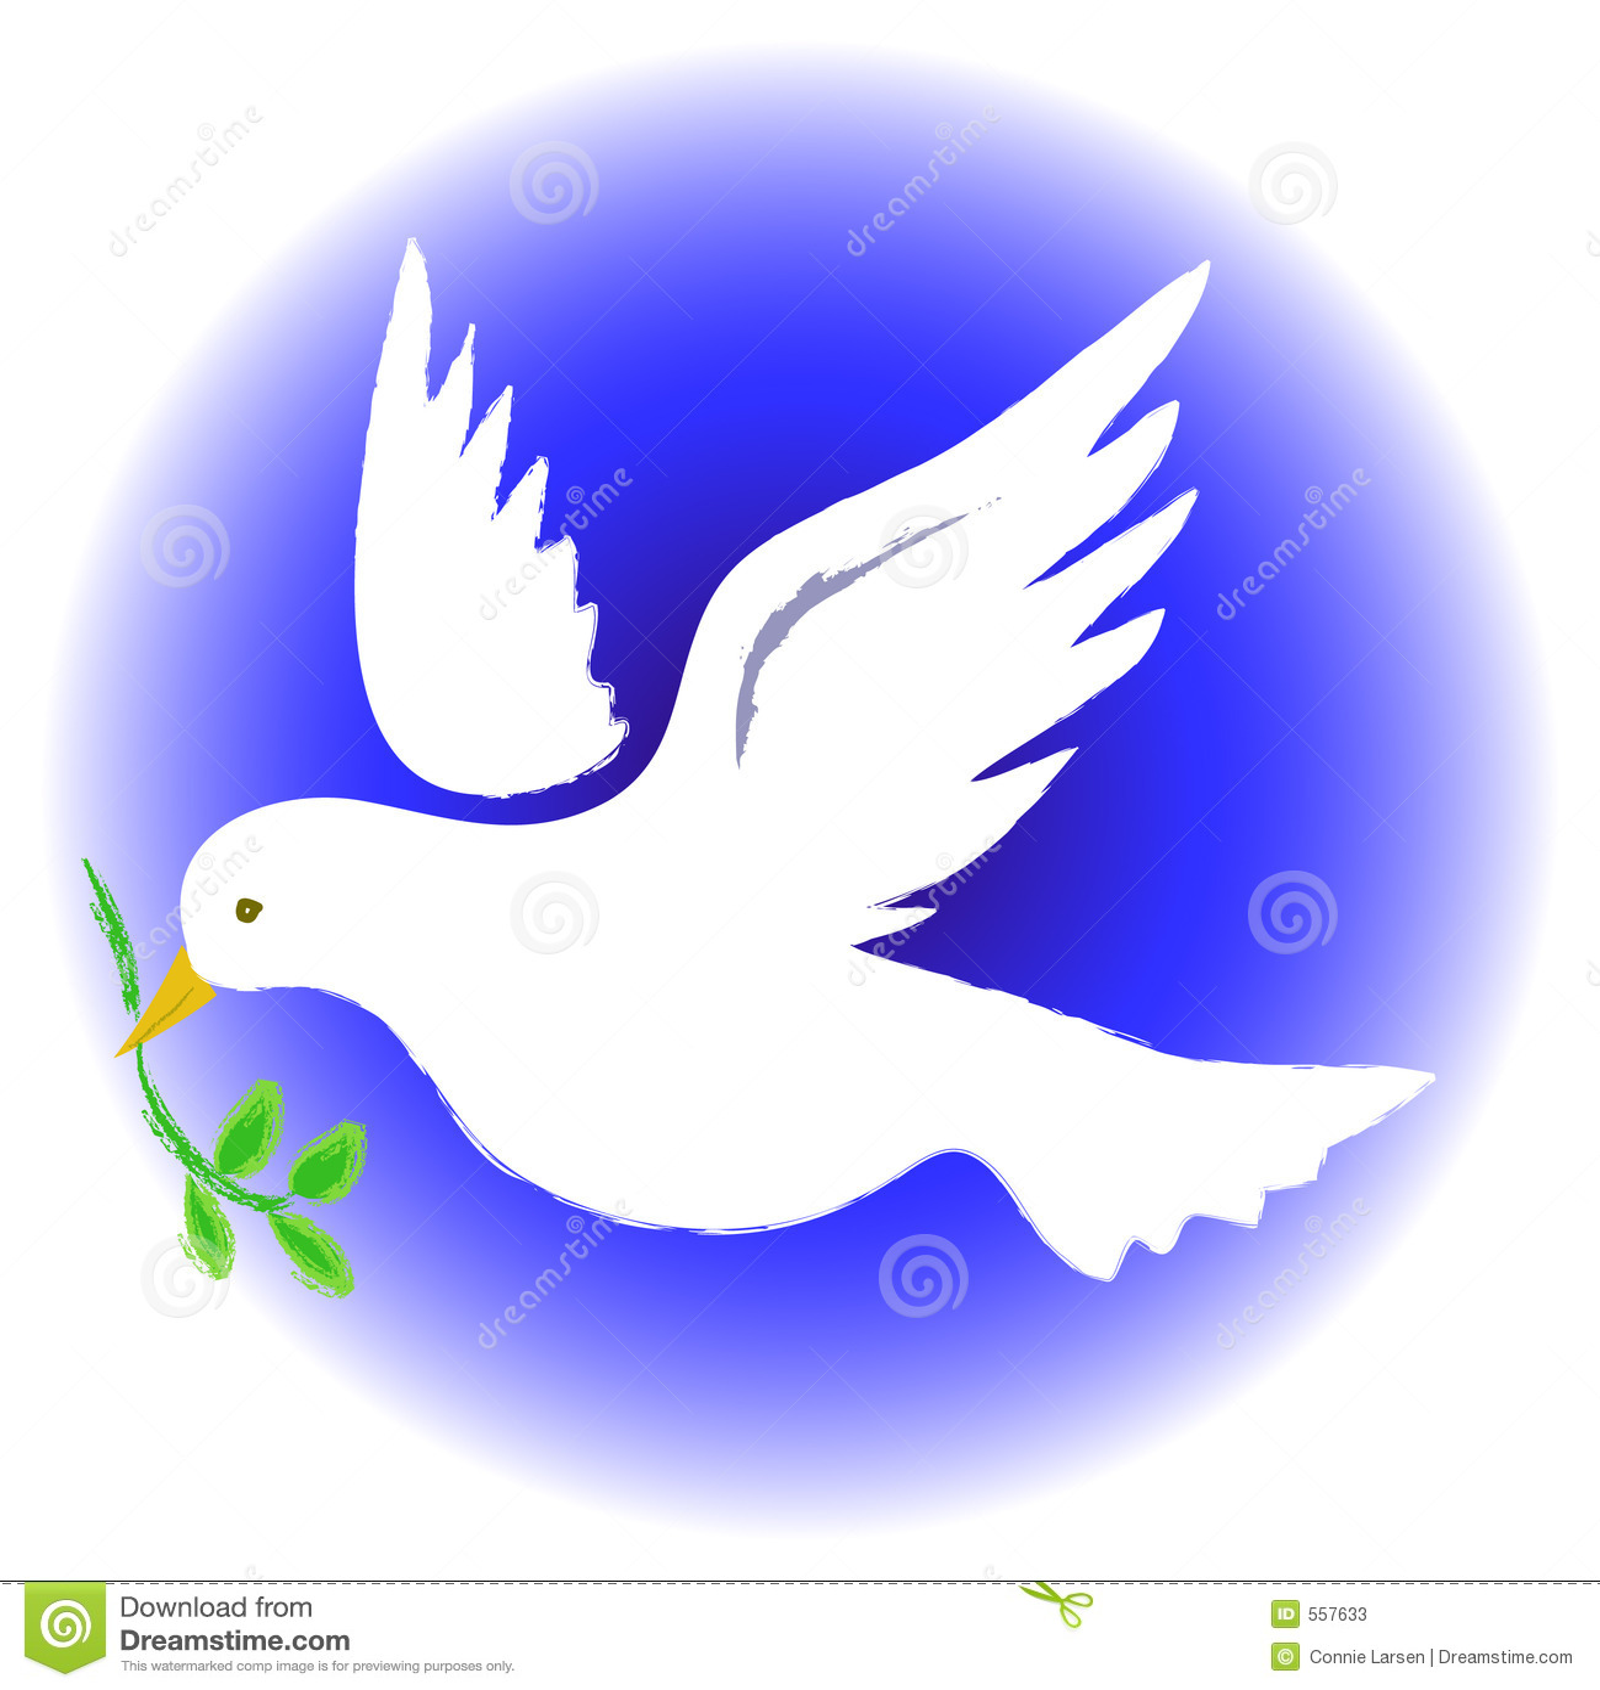 Peace stock illustrations 96267 peace stock illustrations peace dove round illustration of a dove carrying an olive branch symbolizing biocorpaavc Choice Image